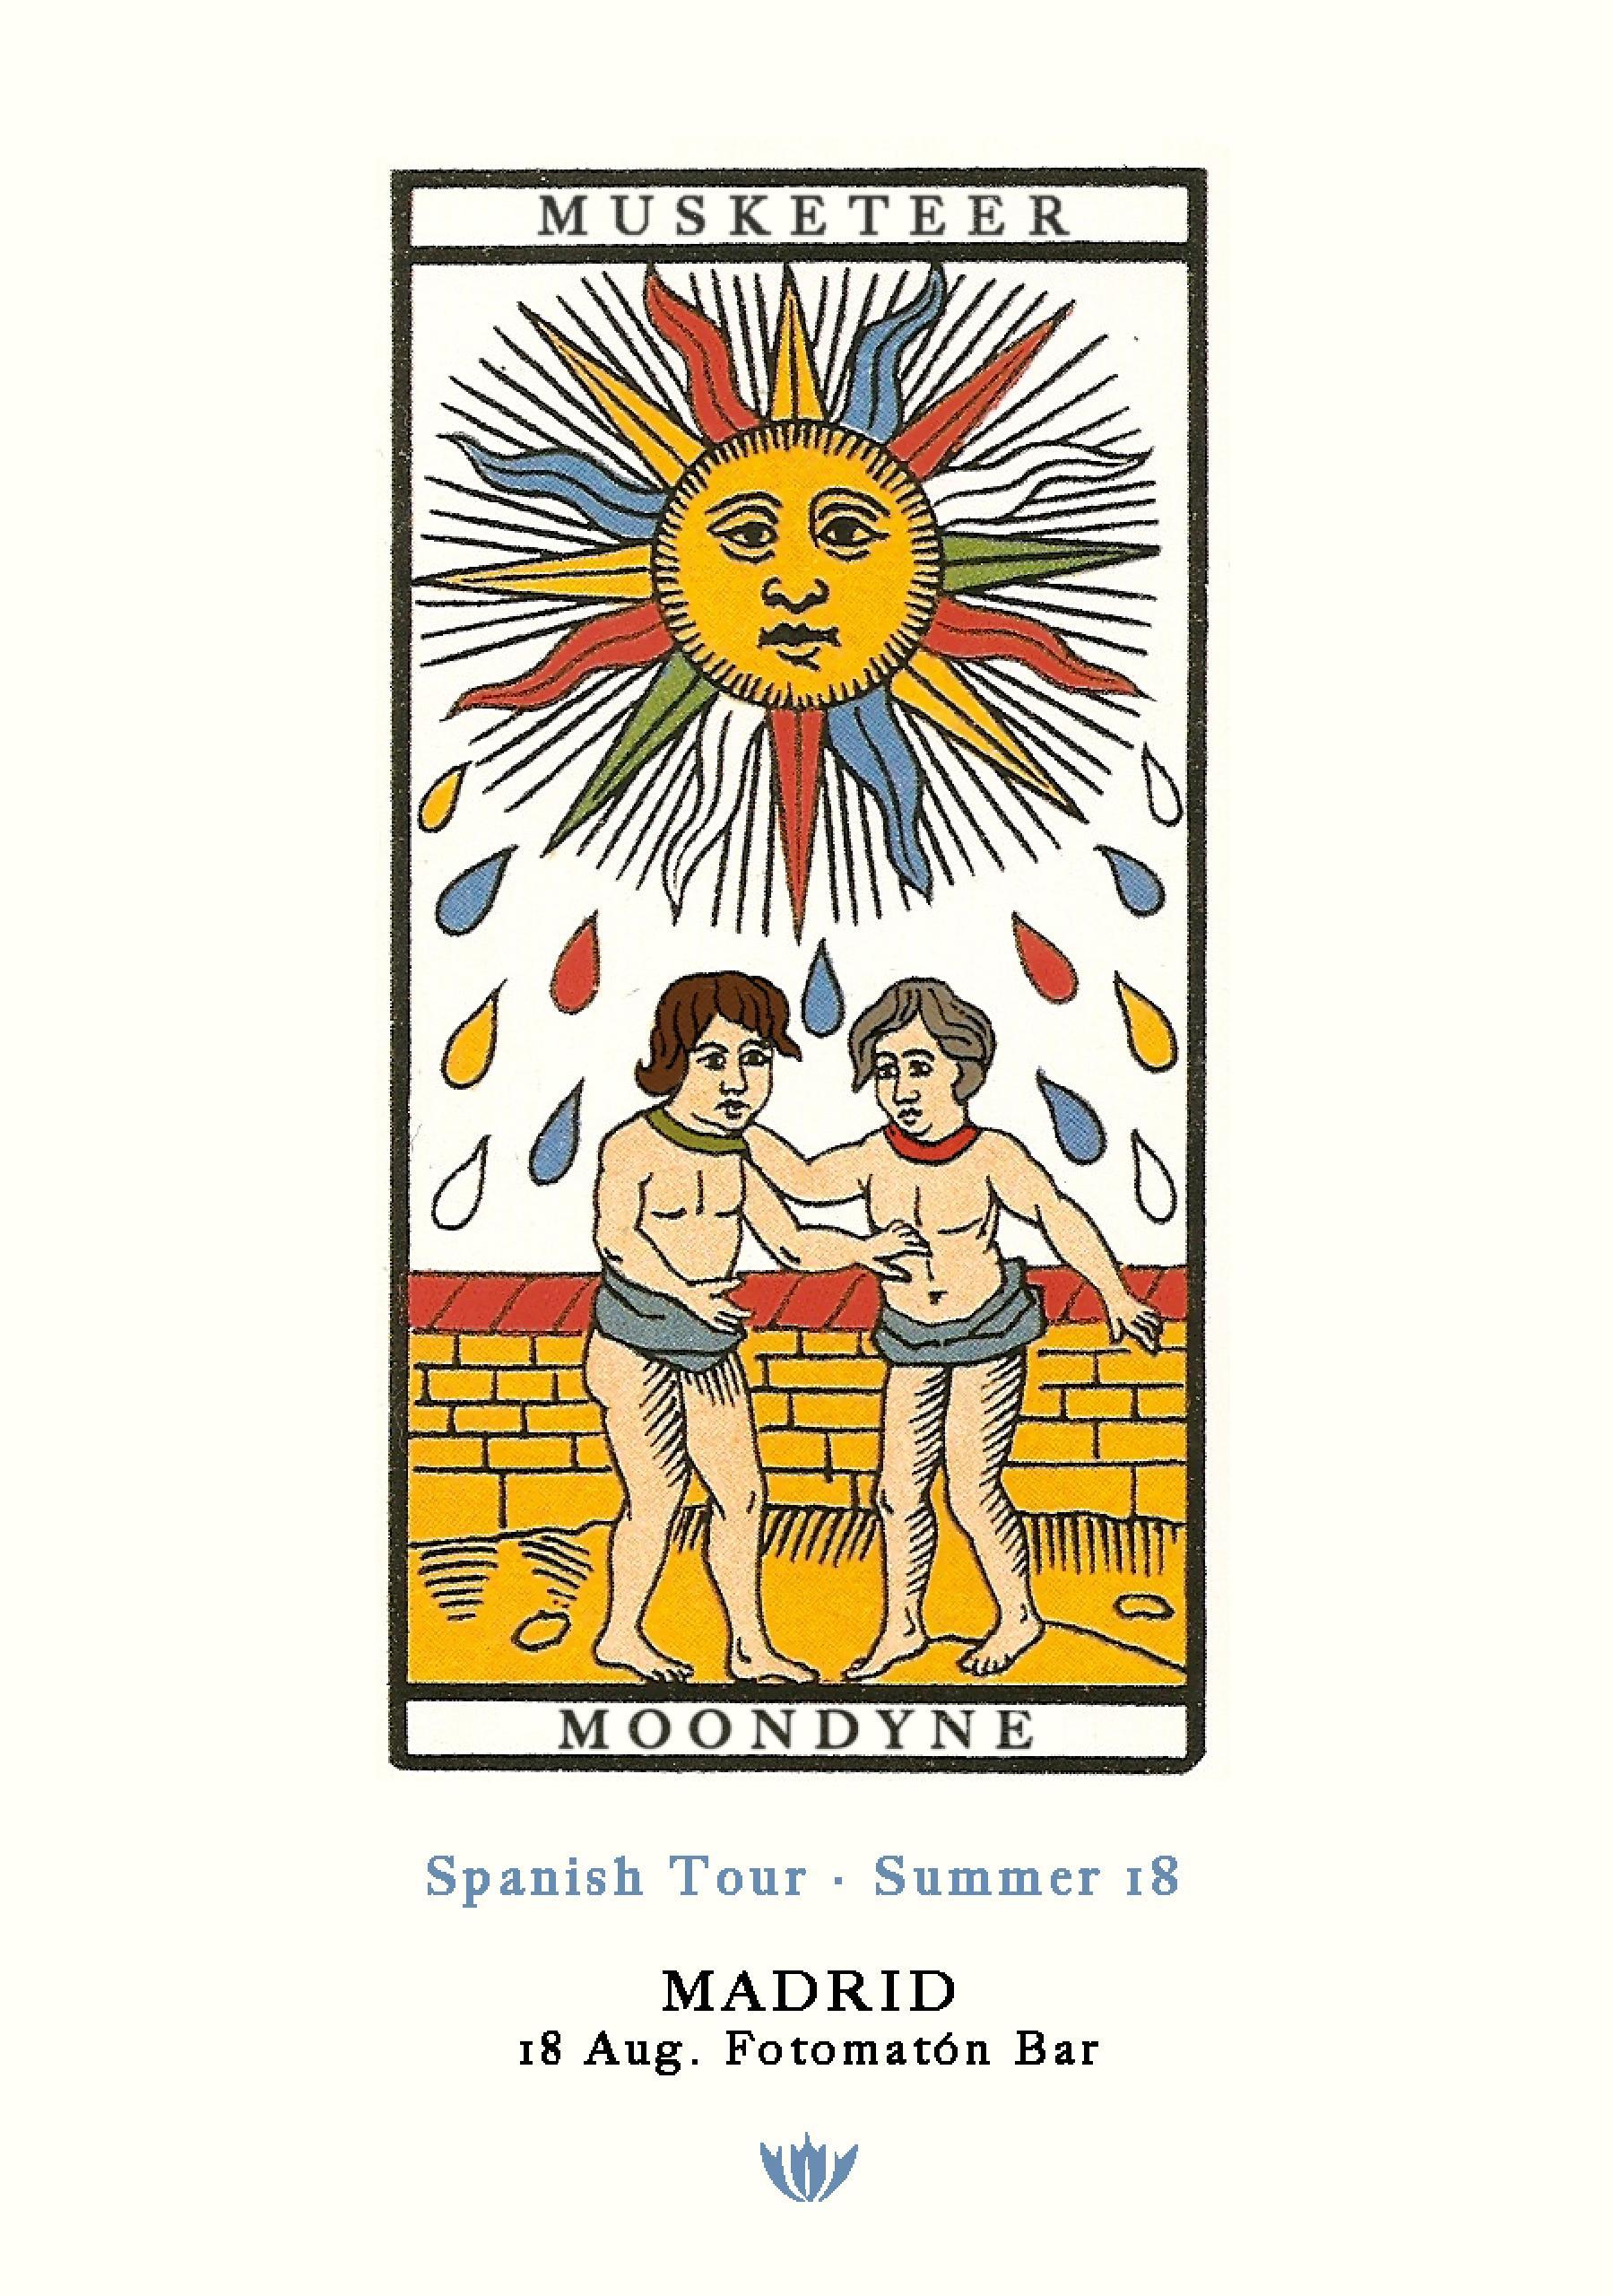 Musketeer & Moondyne · Madrid · Spanish Tour · Summer '18